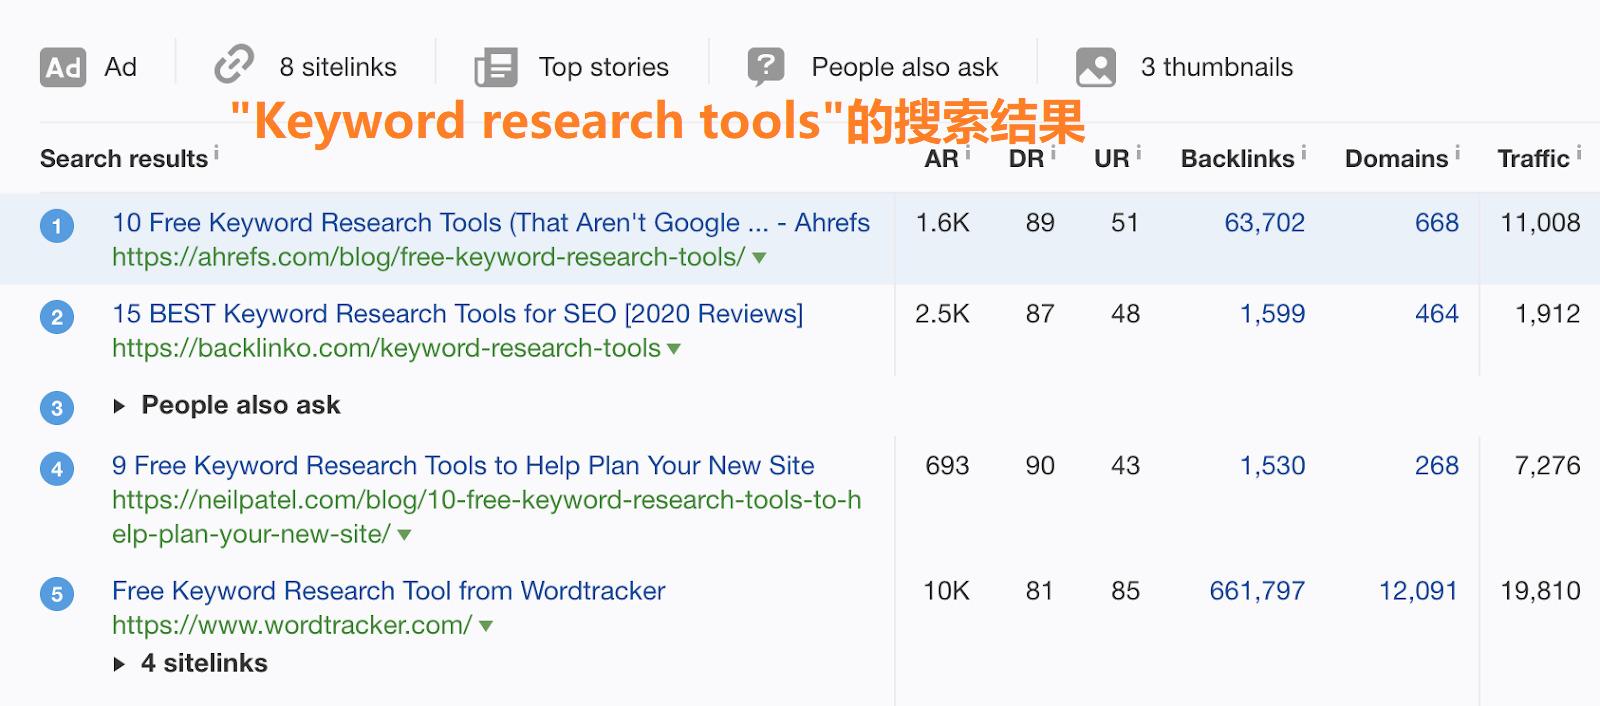 OK7 keyword research tools ranking